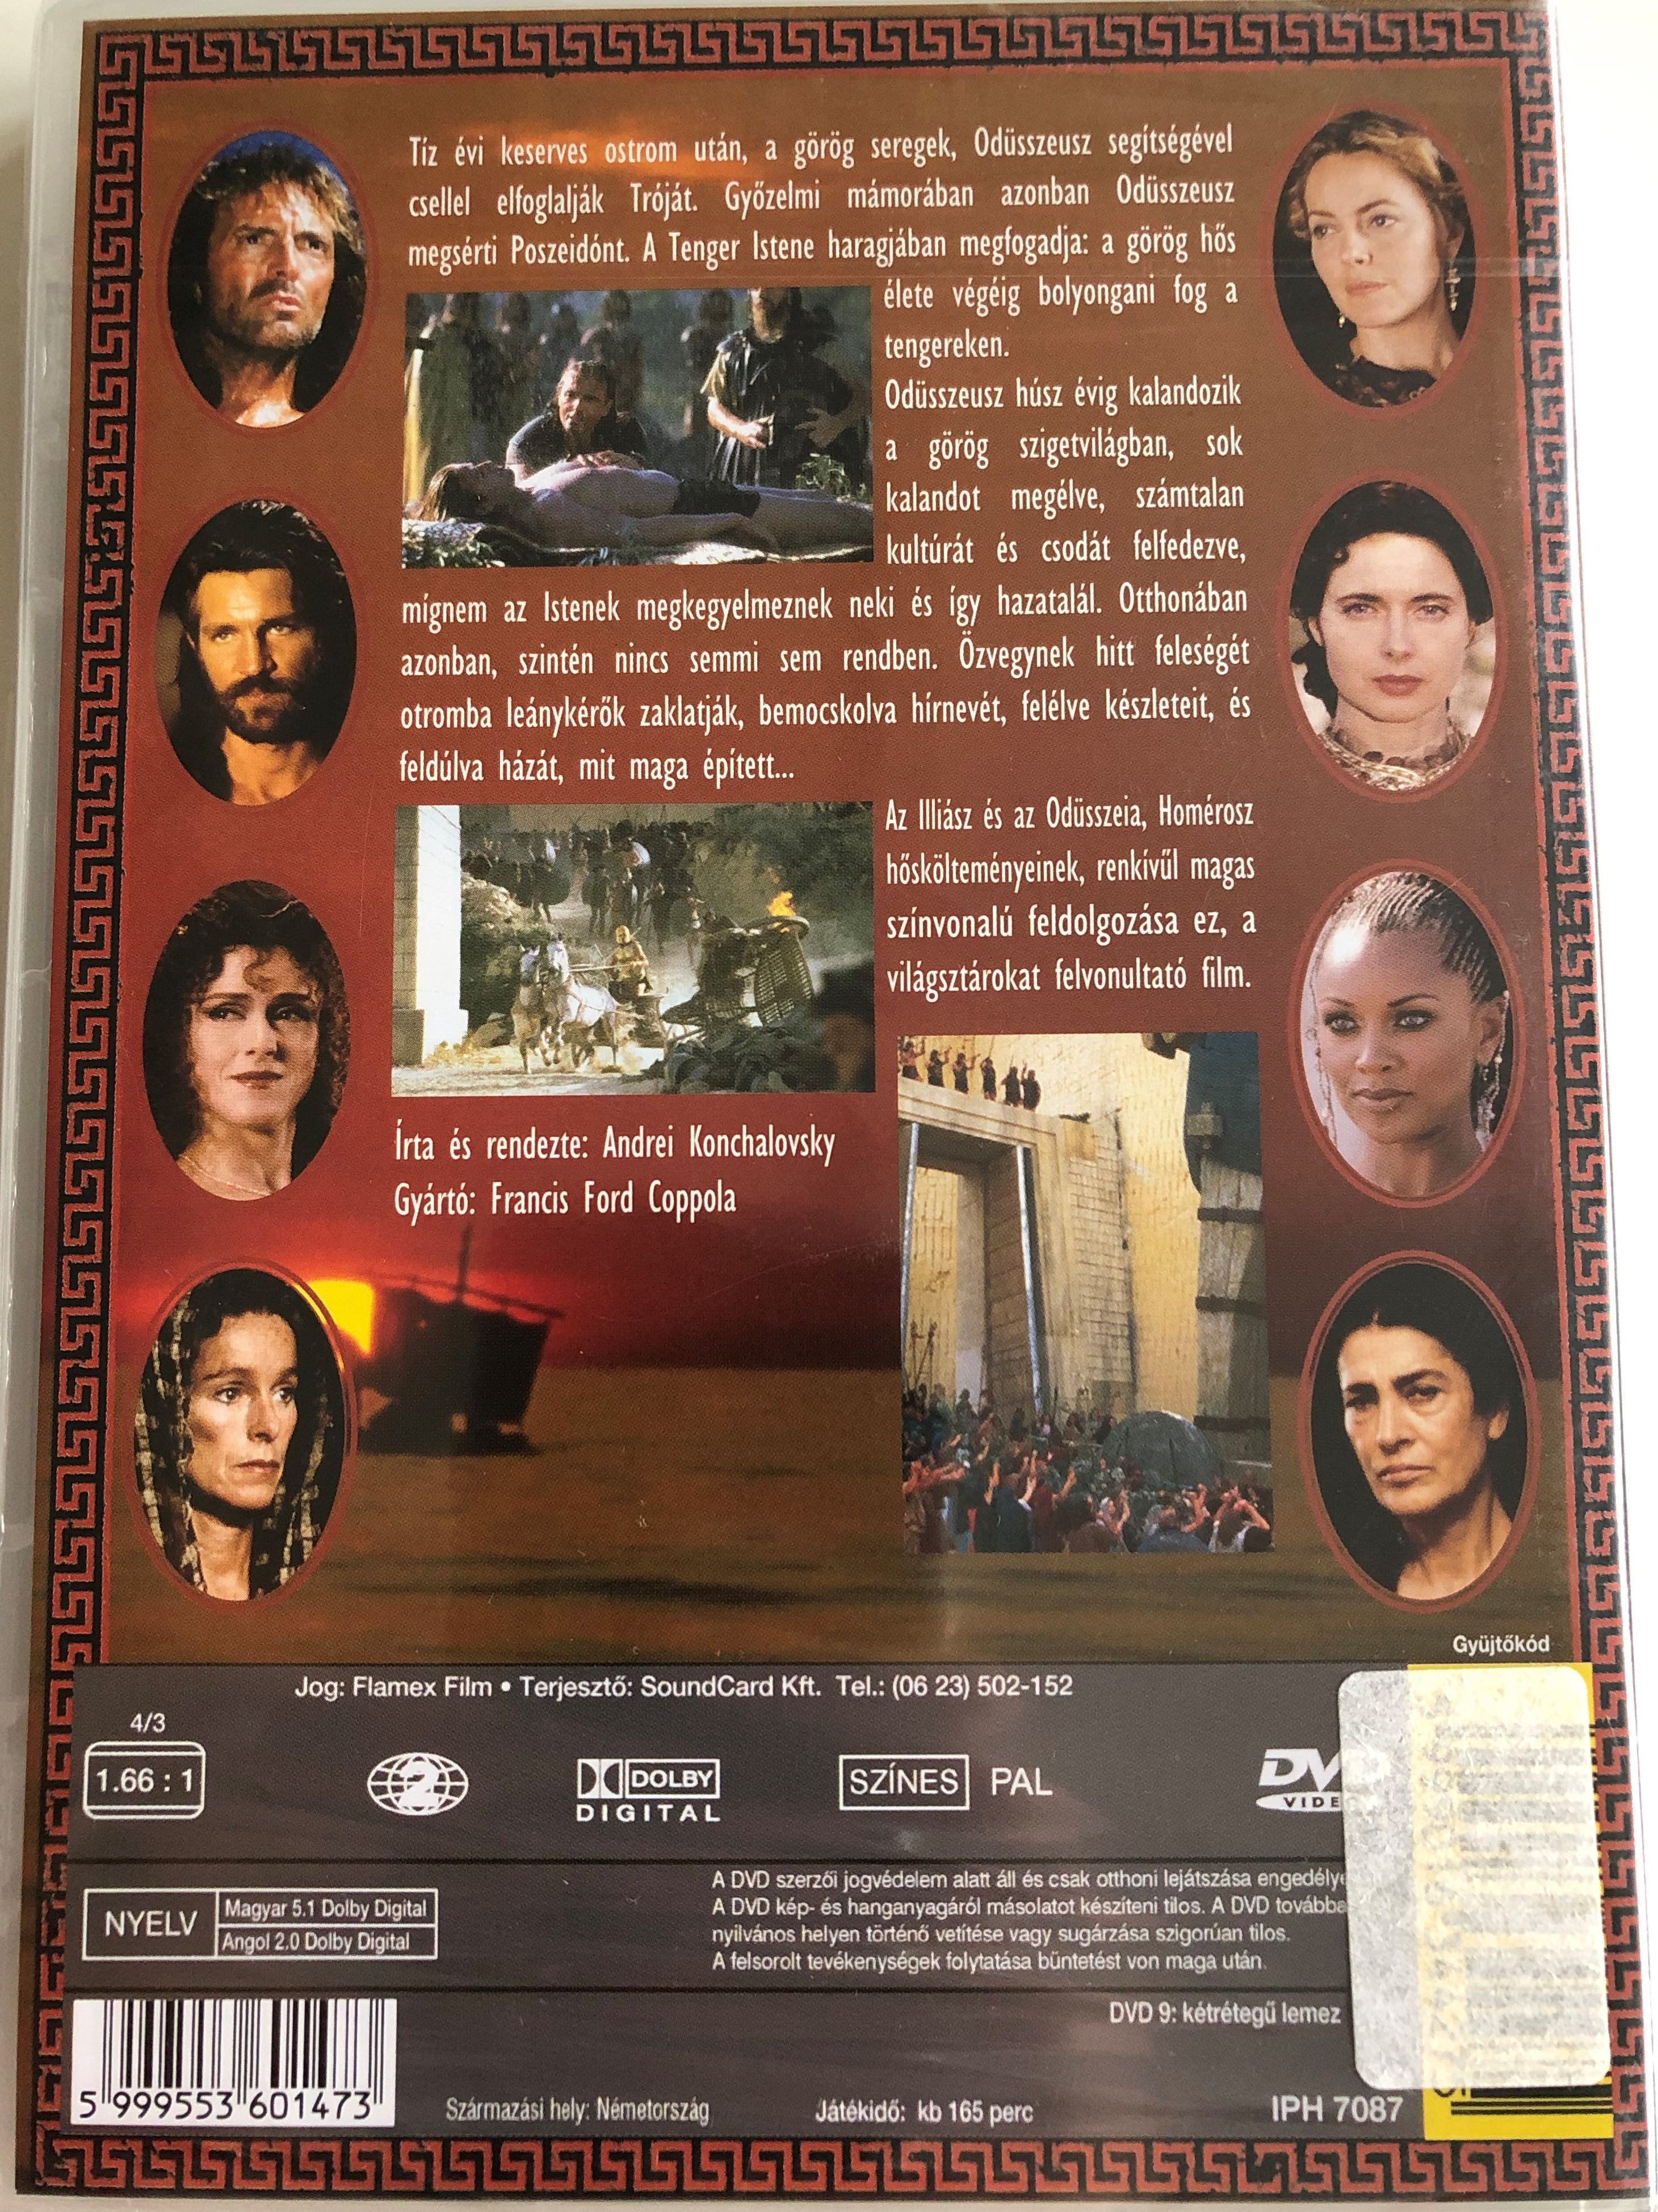 the-odyssey-dvd-1997-od-sszeusz-directed-by-andrei-konchalovsky-2.jpg